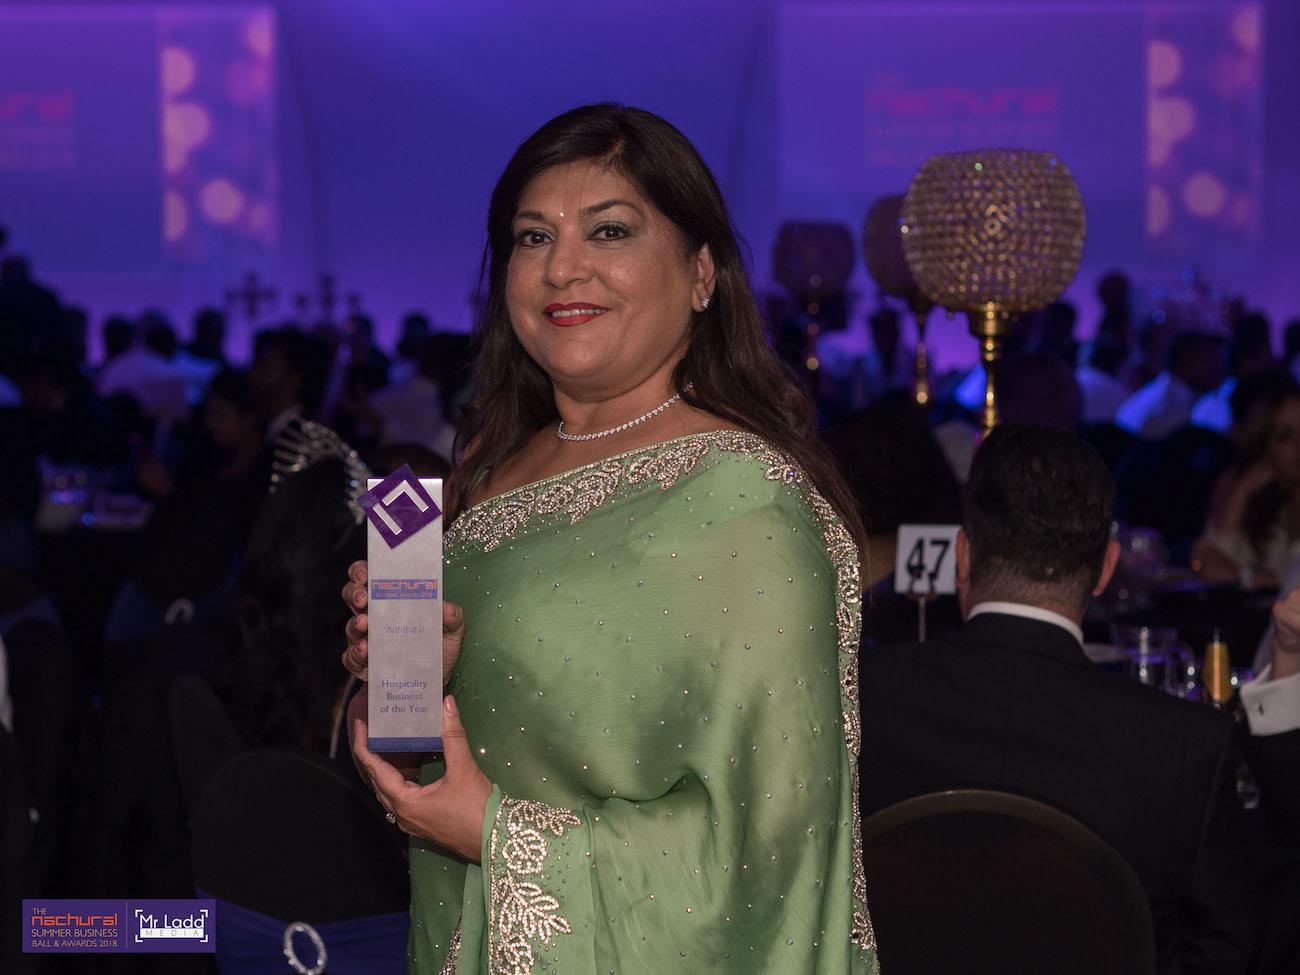 2018 Nachural Awards